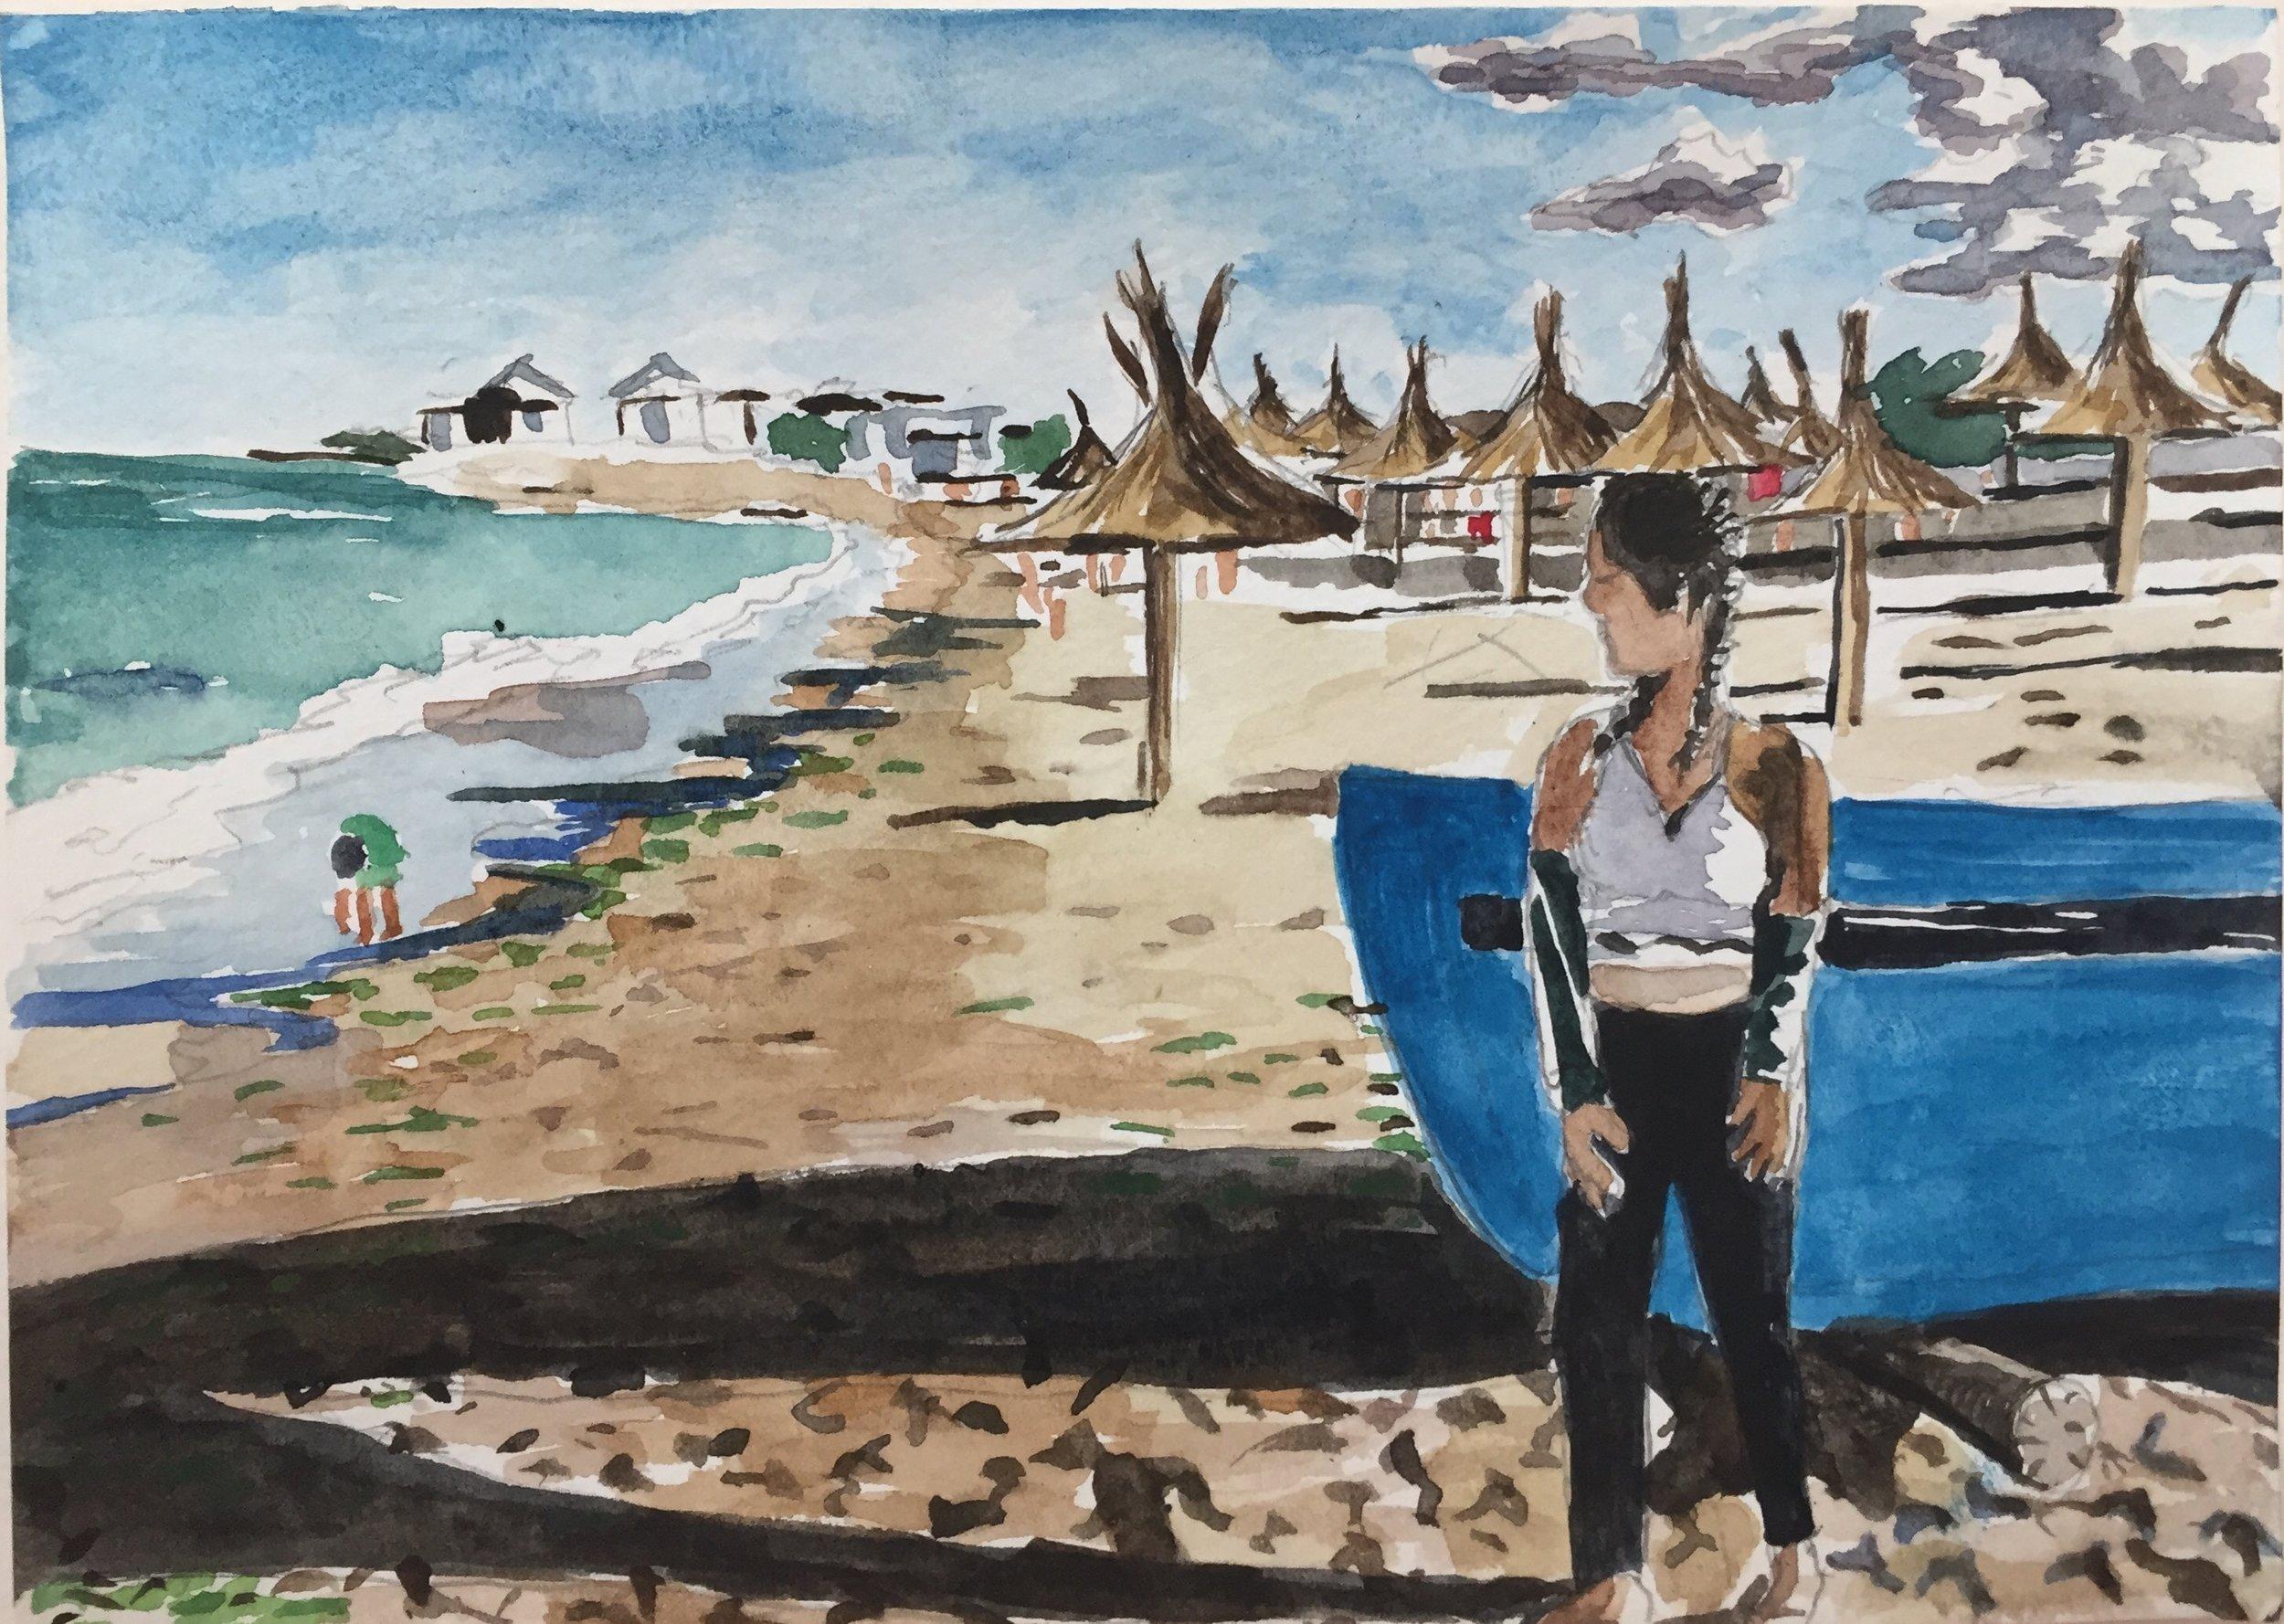 Chloe at the Black Sea, 2019, 4 1/2 x 6 1/2 in., watercolor